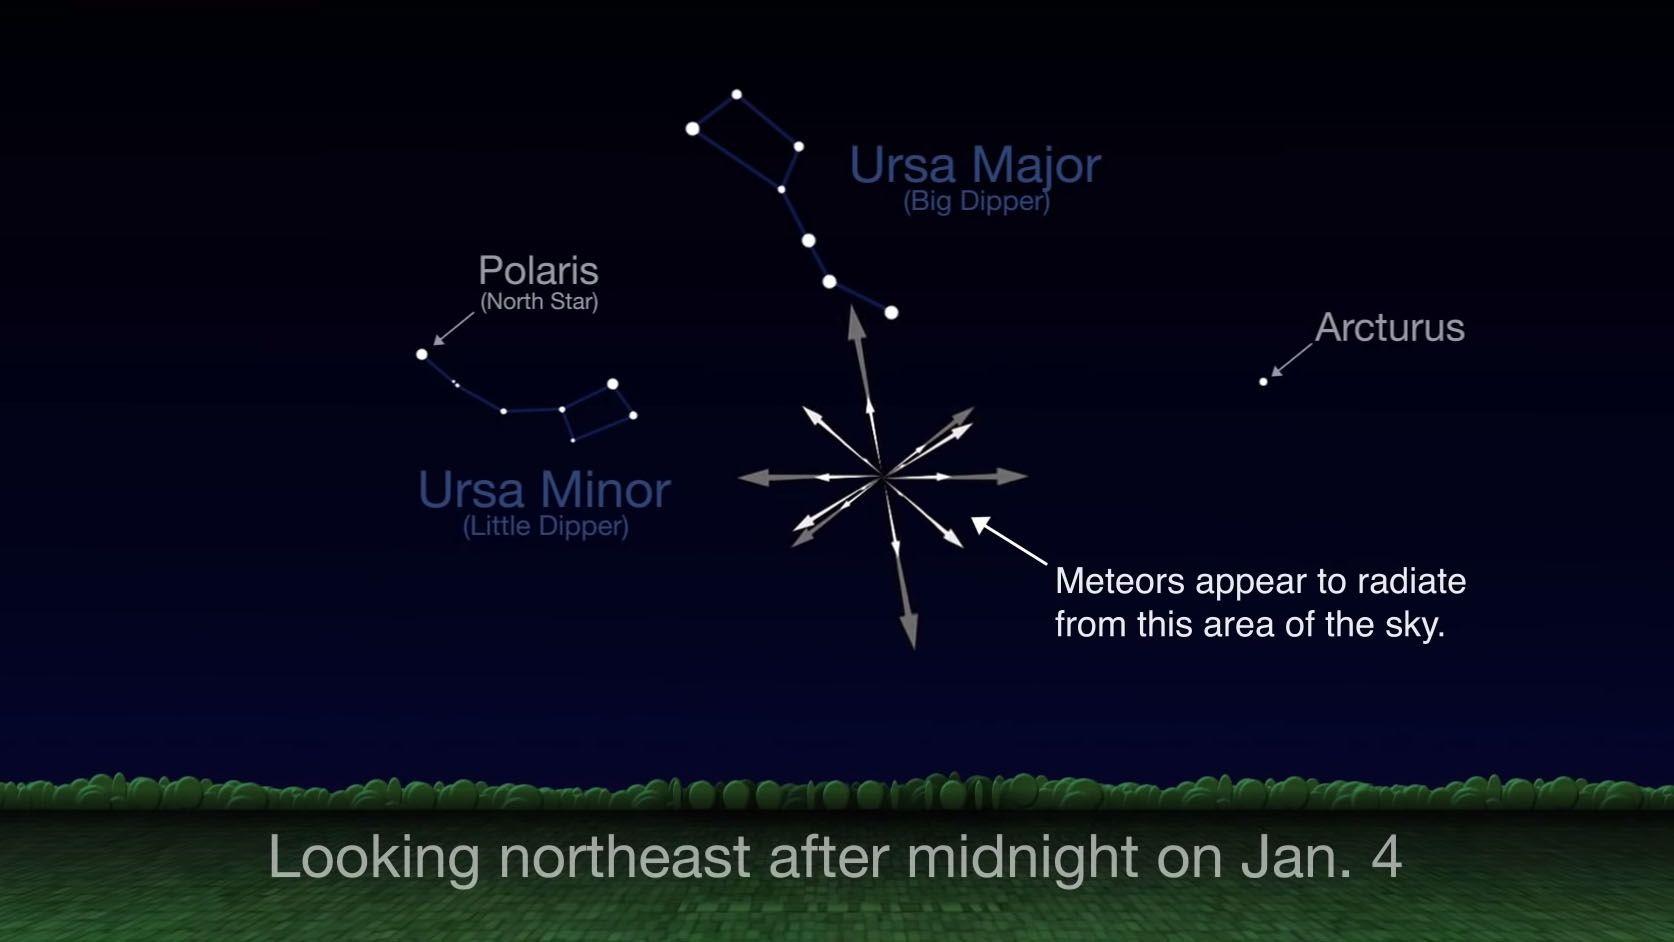 Meteor shower to light up skies - British Columbia - CBC News  |Meteor Shower Calendar 2013 North America